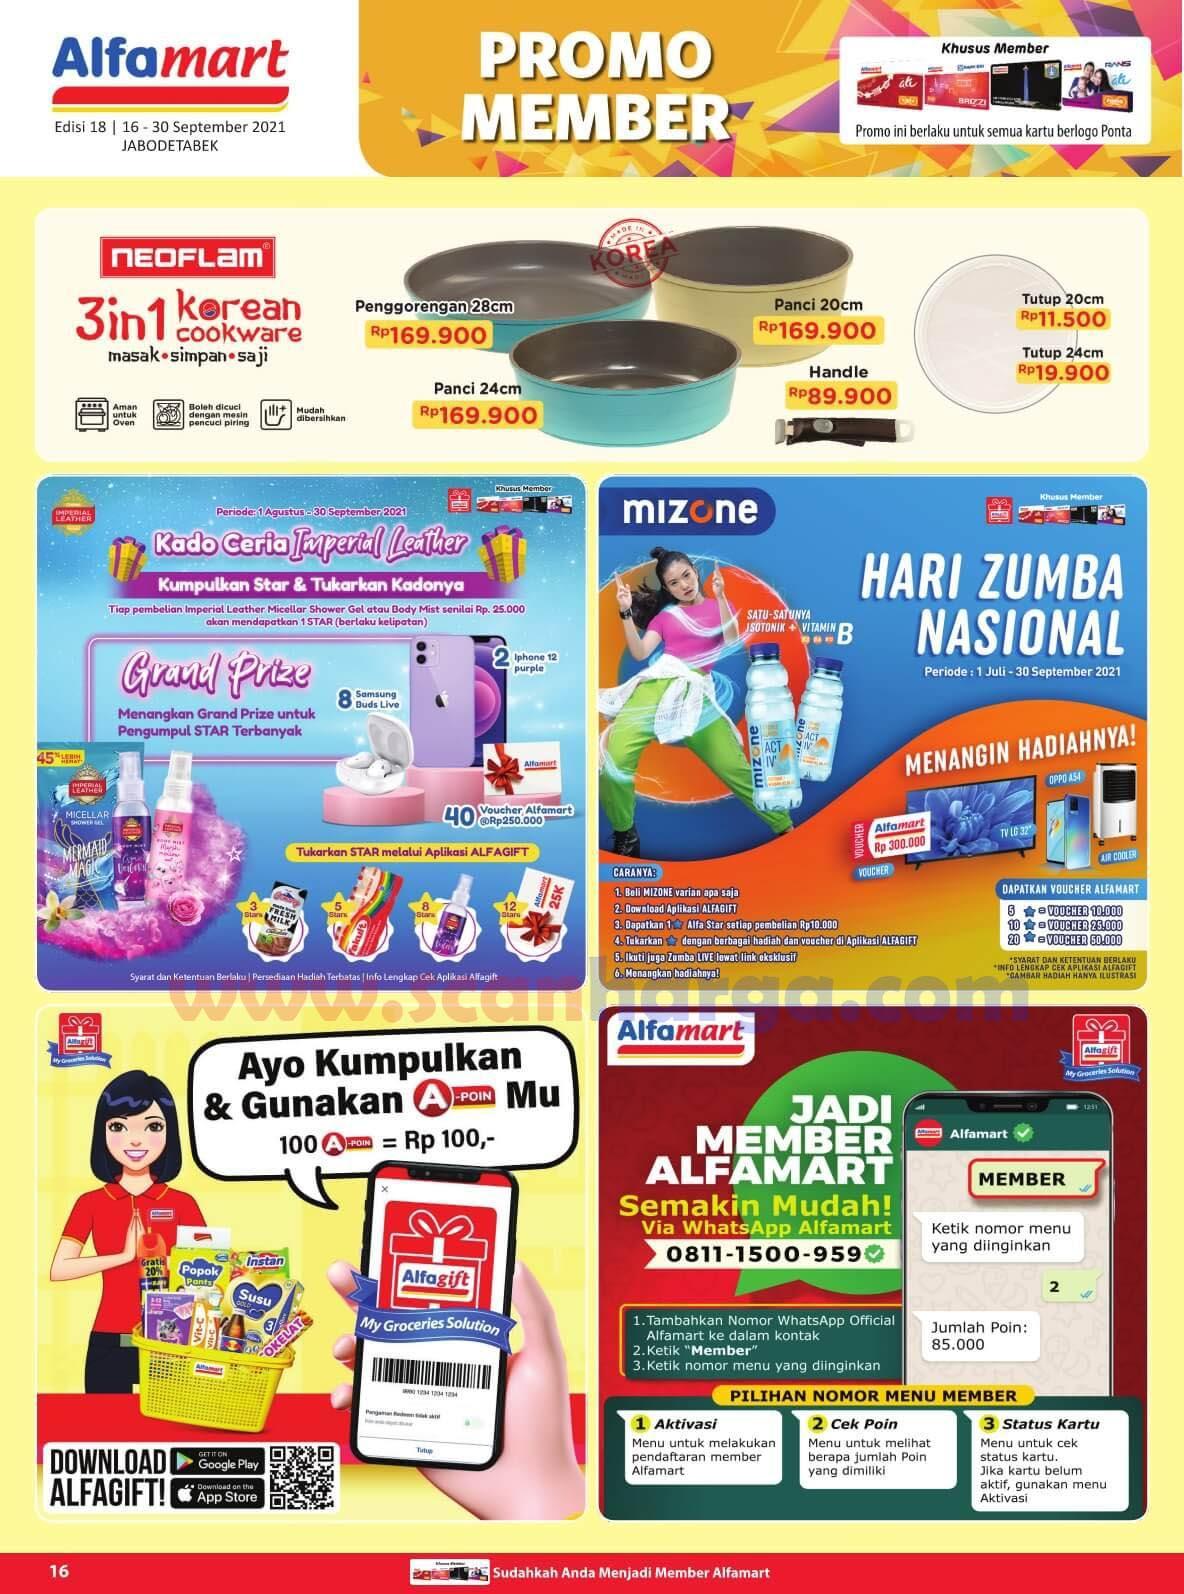 Katalog Promo Alfamart 16 - 30 September 2021 16